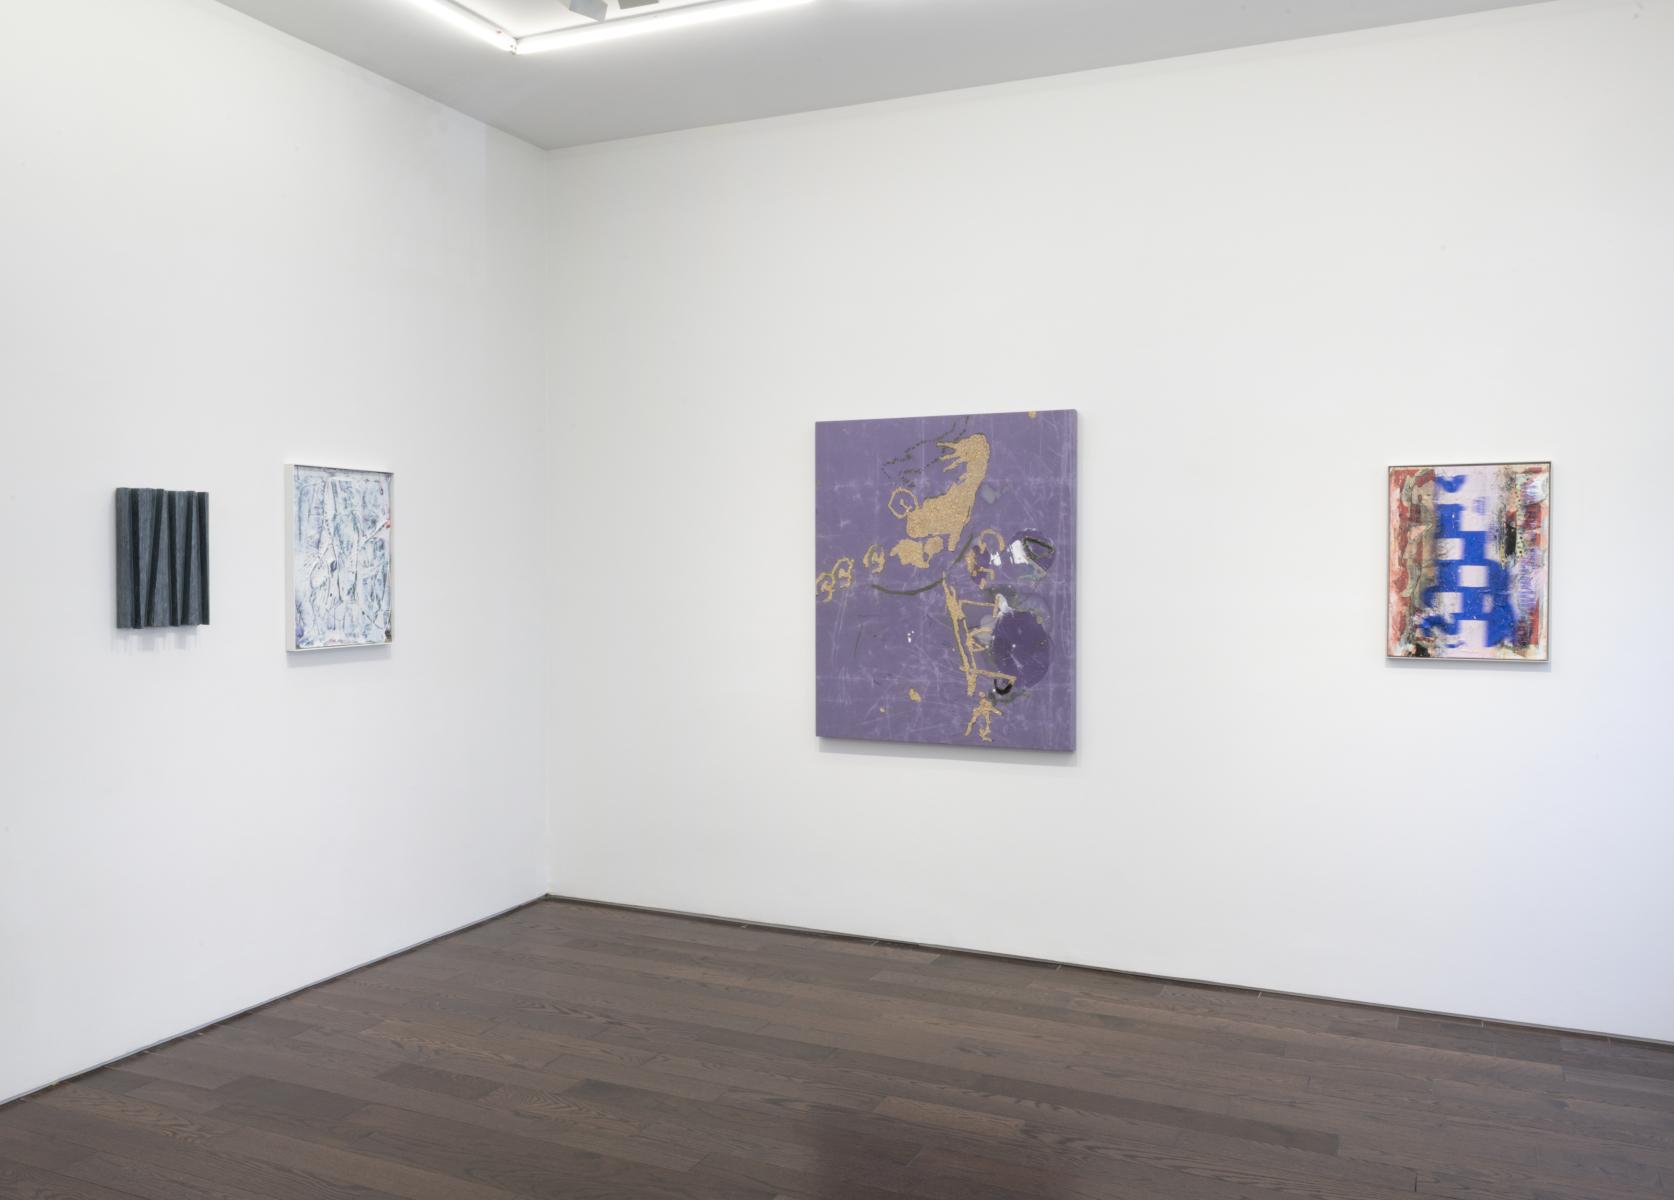 Exhibition View Wrecked Angle Ceysson & Bénétière New York 2021 (2)